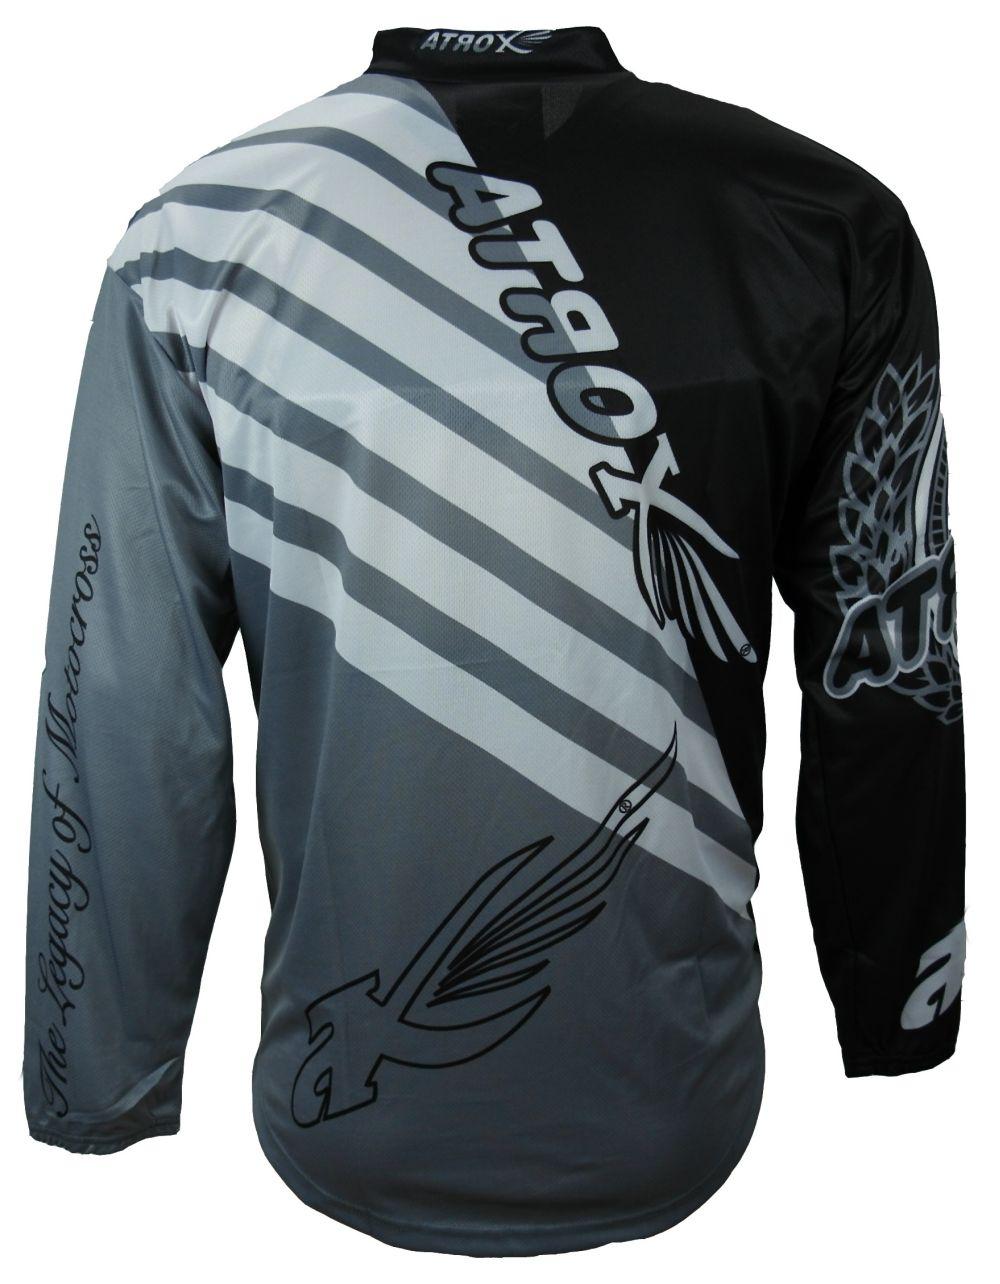 Heyberry MX-Cross Quad Motocross Shirt Jersey Trikot schwarz weiß grau M - XXL